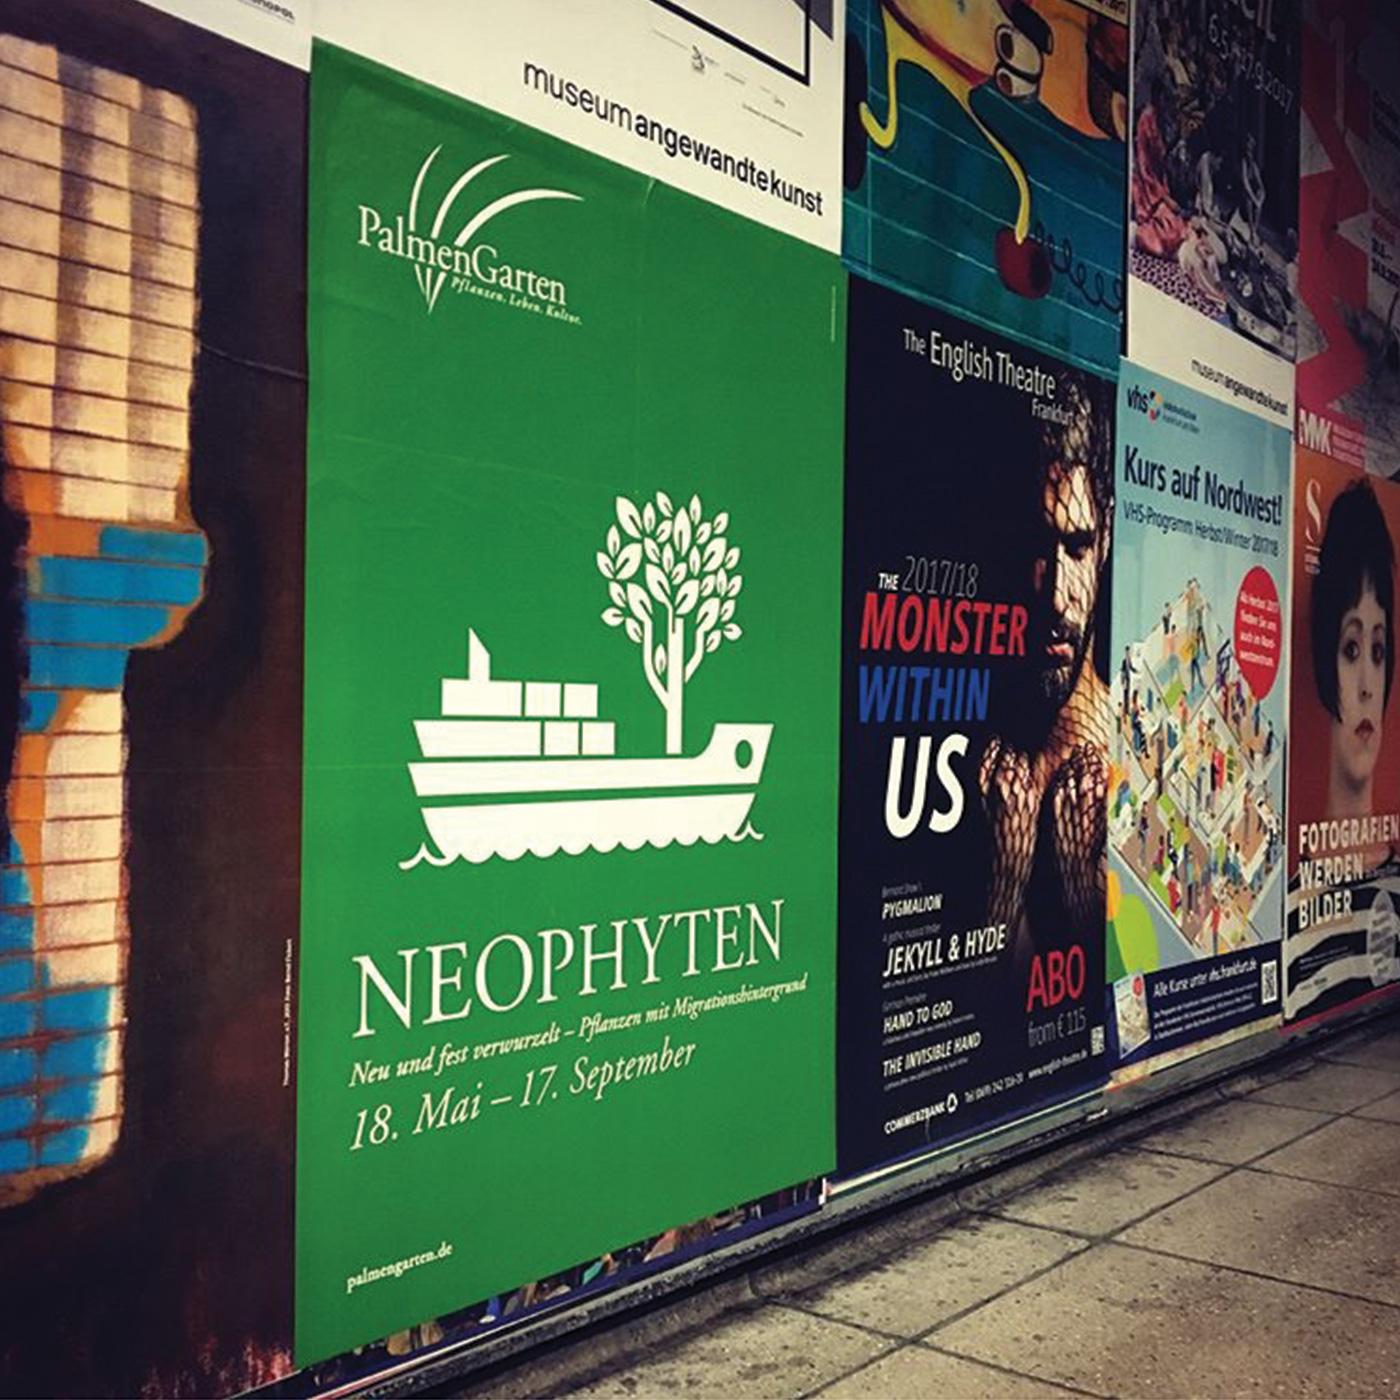 pictograms_andre_levy_zhion_vector_campaign_palmengarten_frankfurt_christian_schoen_neophyten_minimal_icon_poster_3.jpg